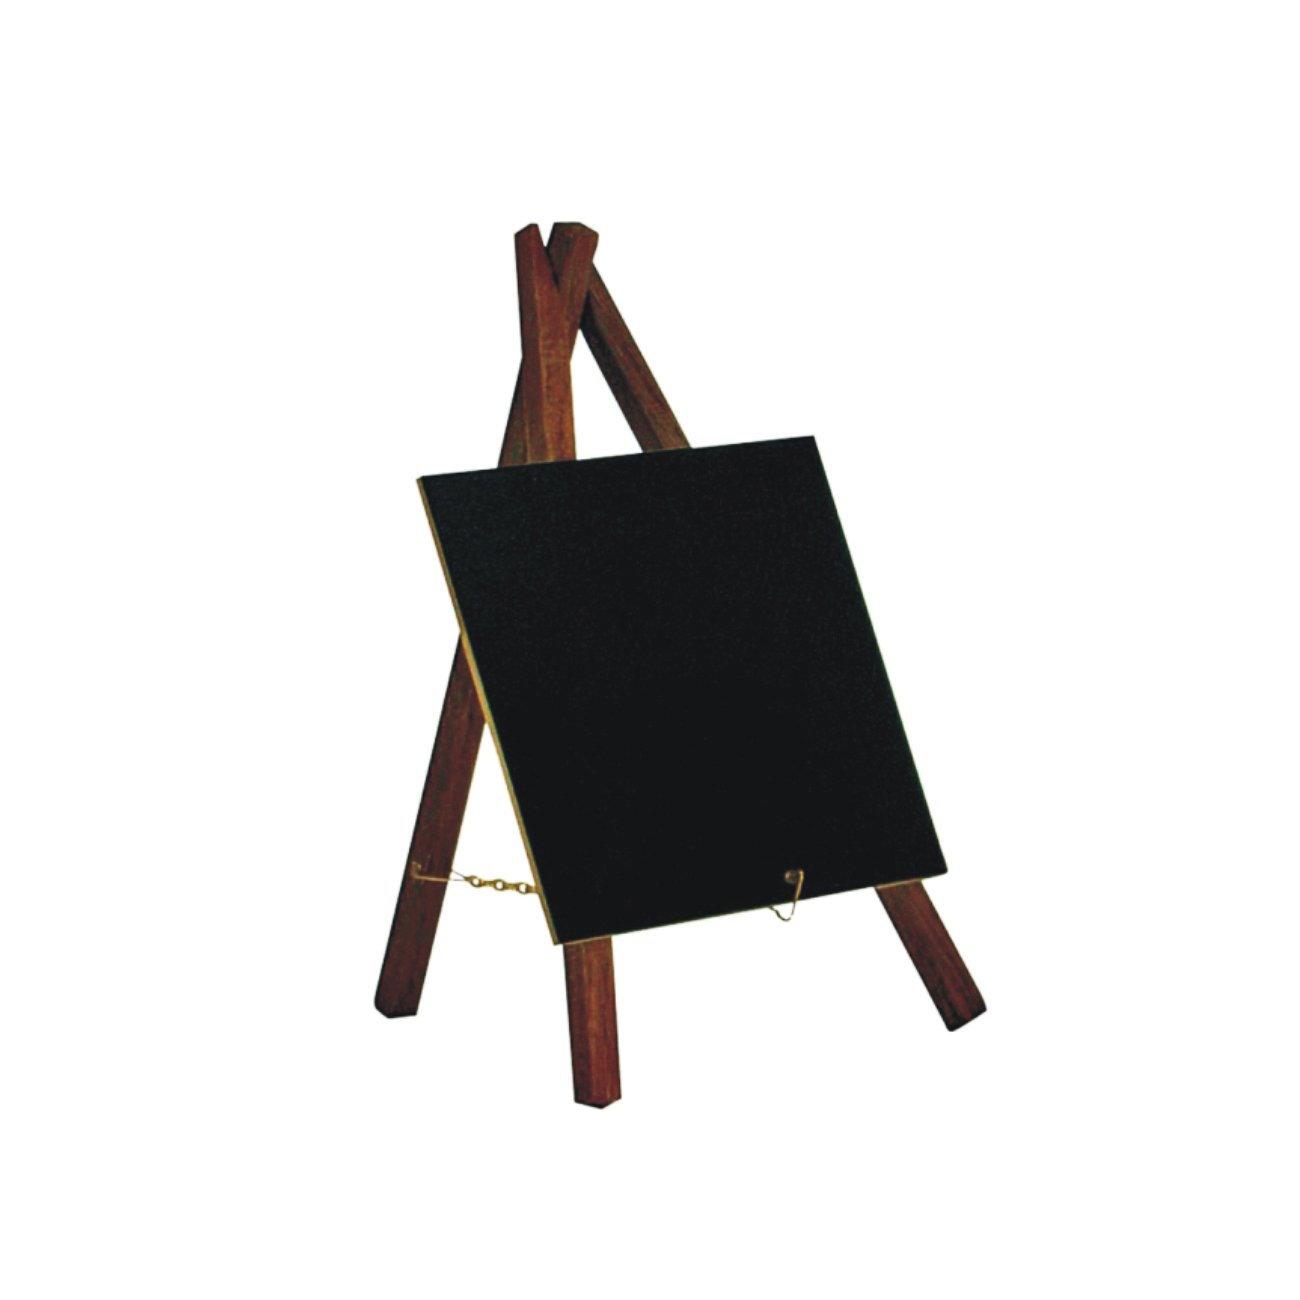 Kreidetafel Aufsteller Holz Staffelei Tafel Werbetafel Holztafel inkl 24 Kreide